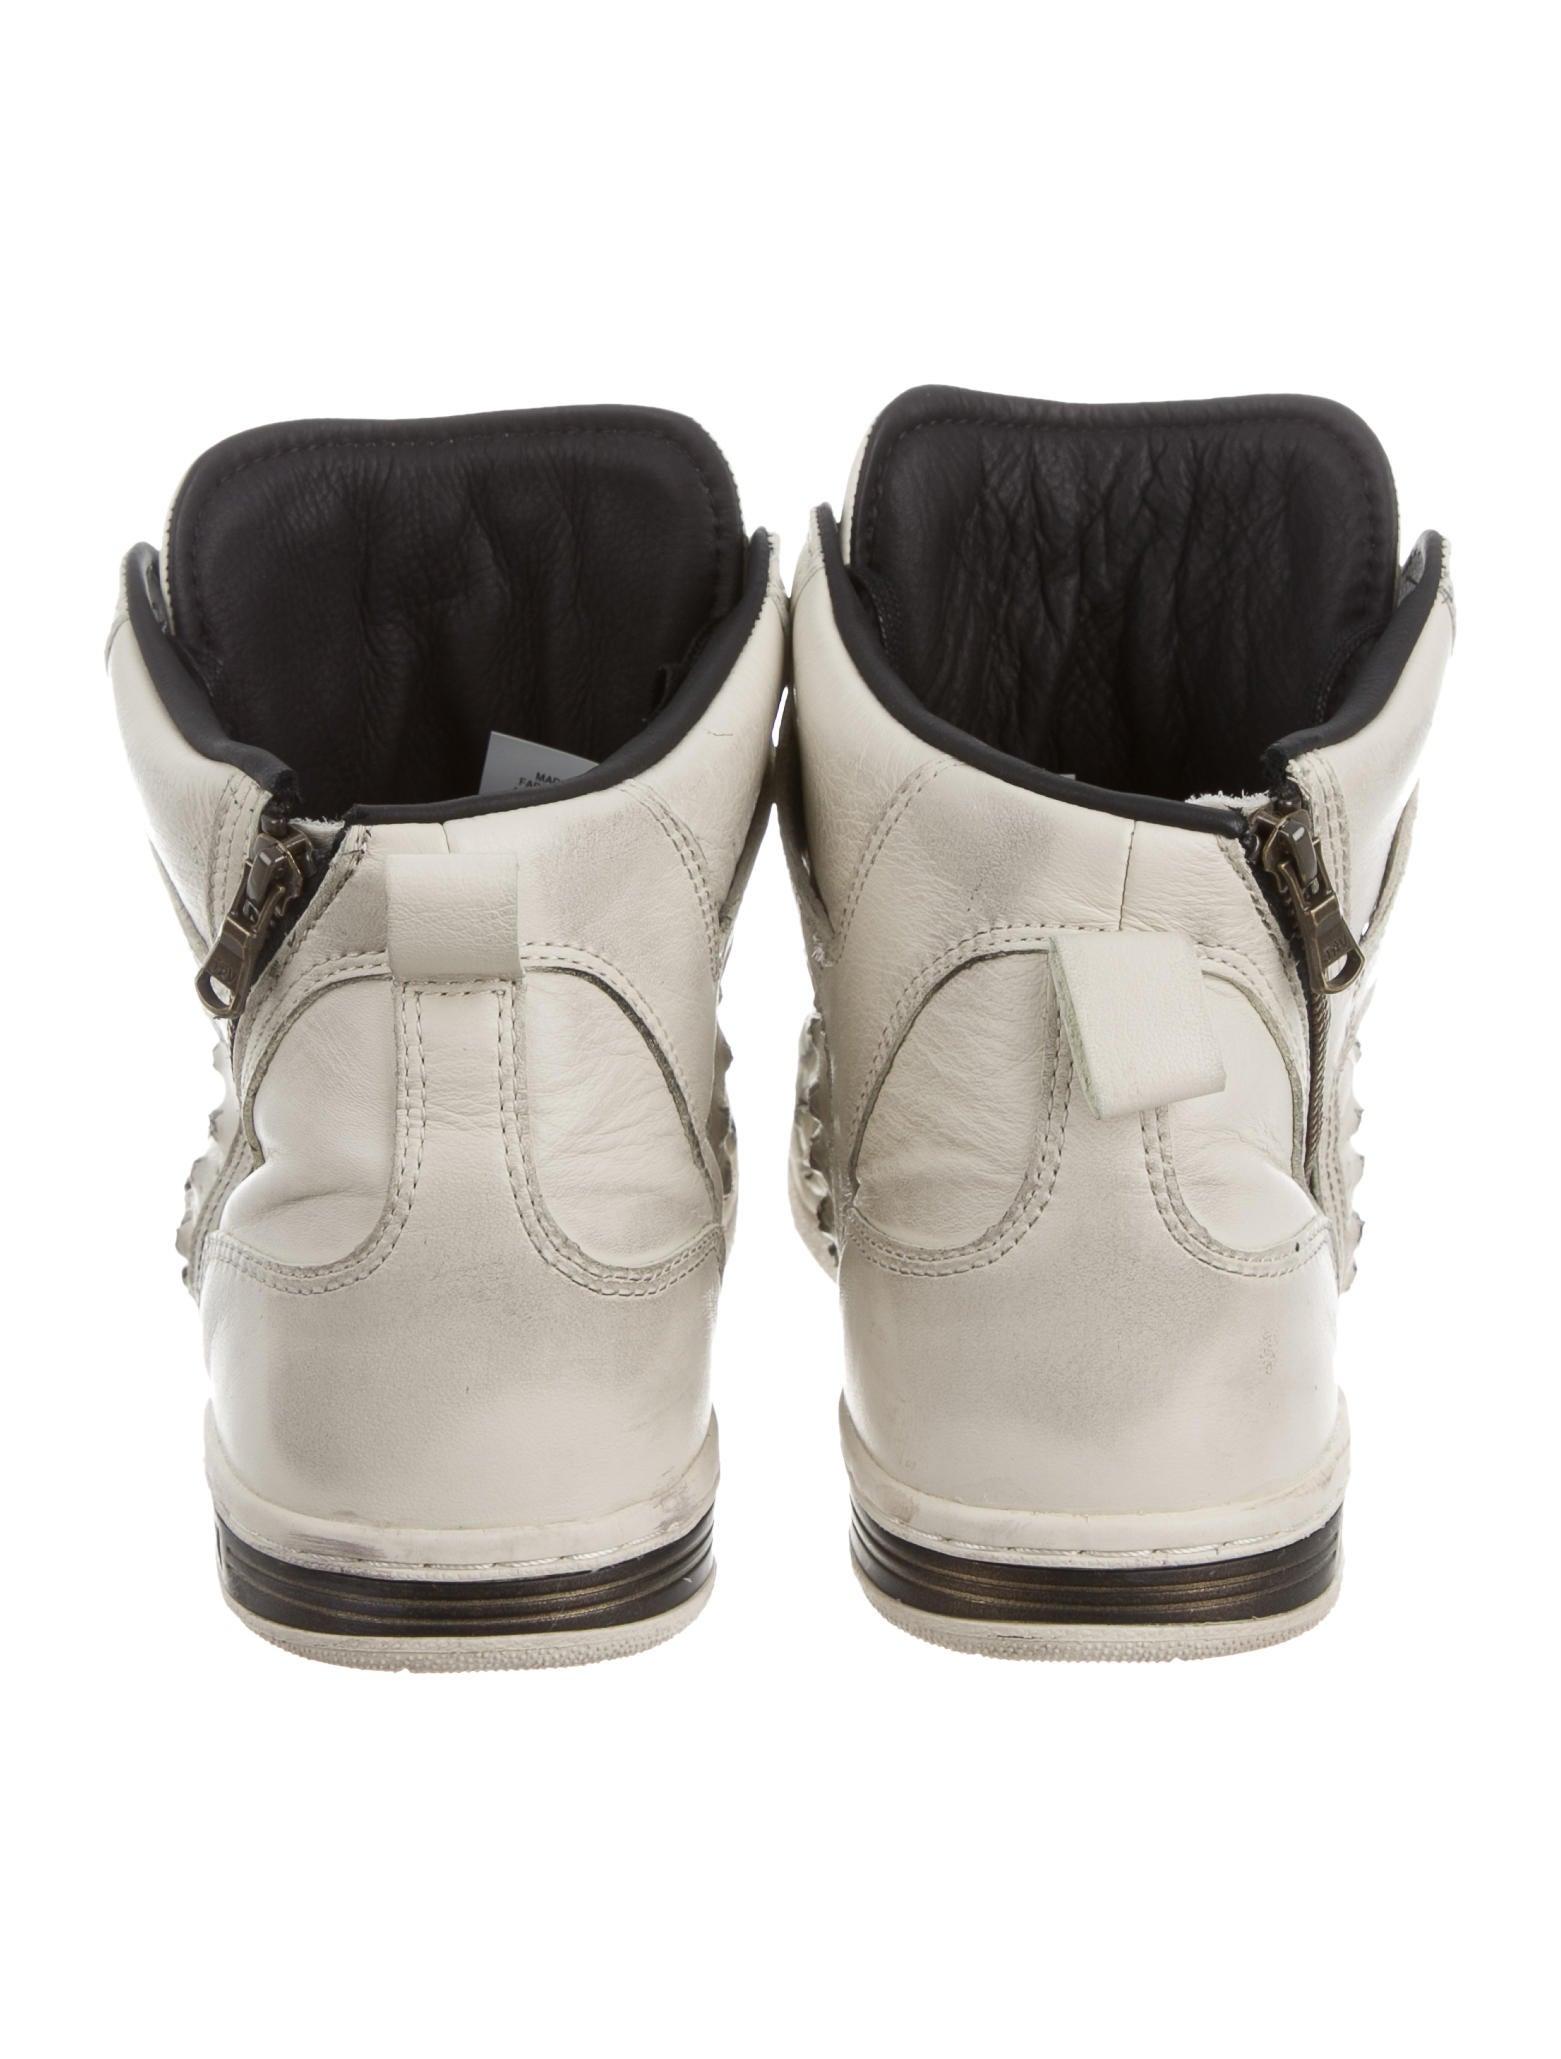 designer converse john varvatos mji1  Weapon High-Top Sneakers w/ Tags